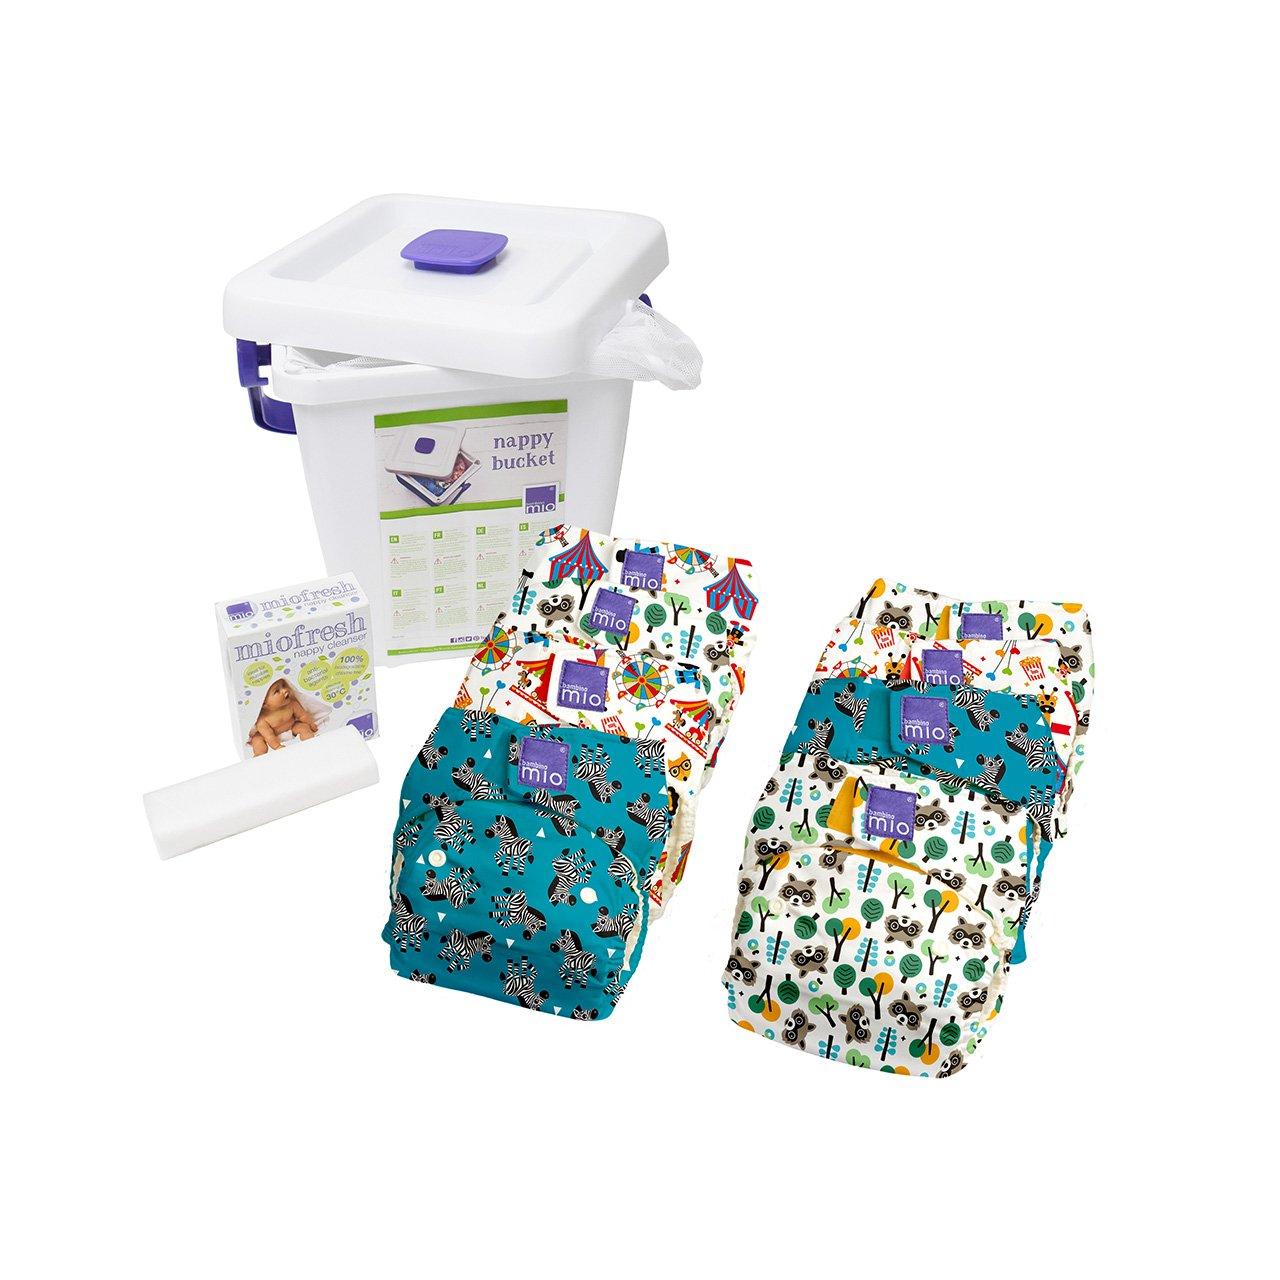 mix Bambino Mio miosolo pack de pa/ñales reutilizables